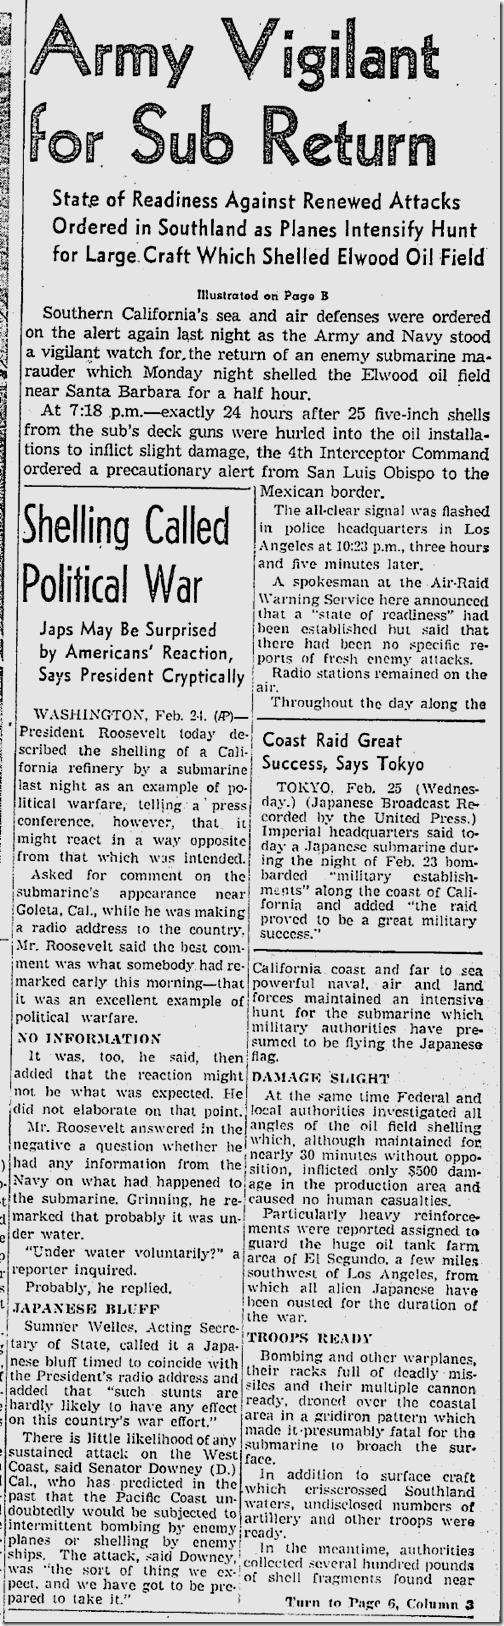 Feb. 25, 1942, Sub Return